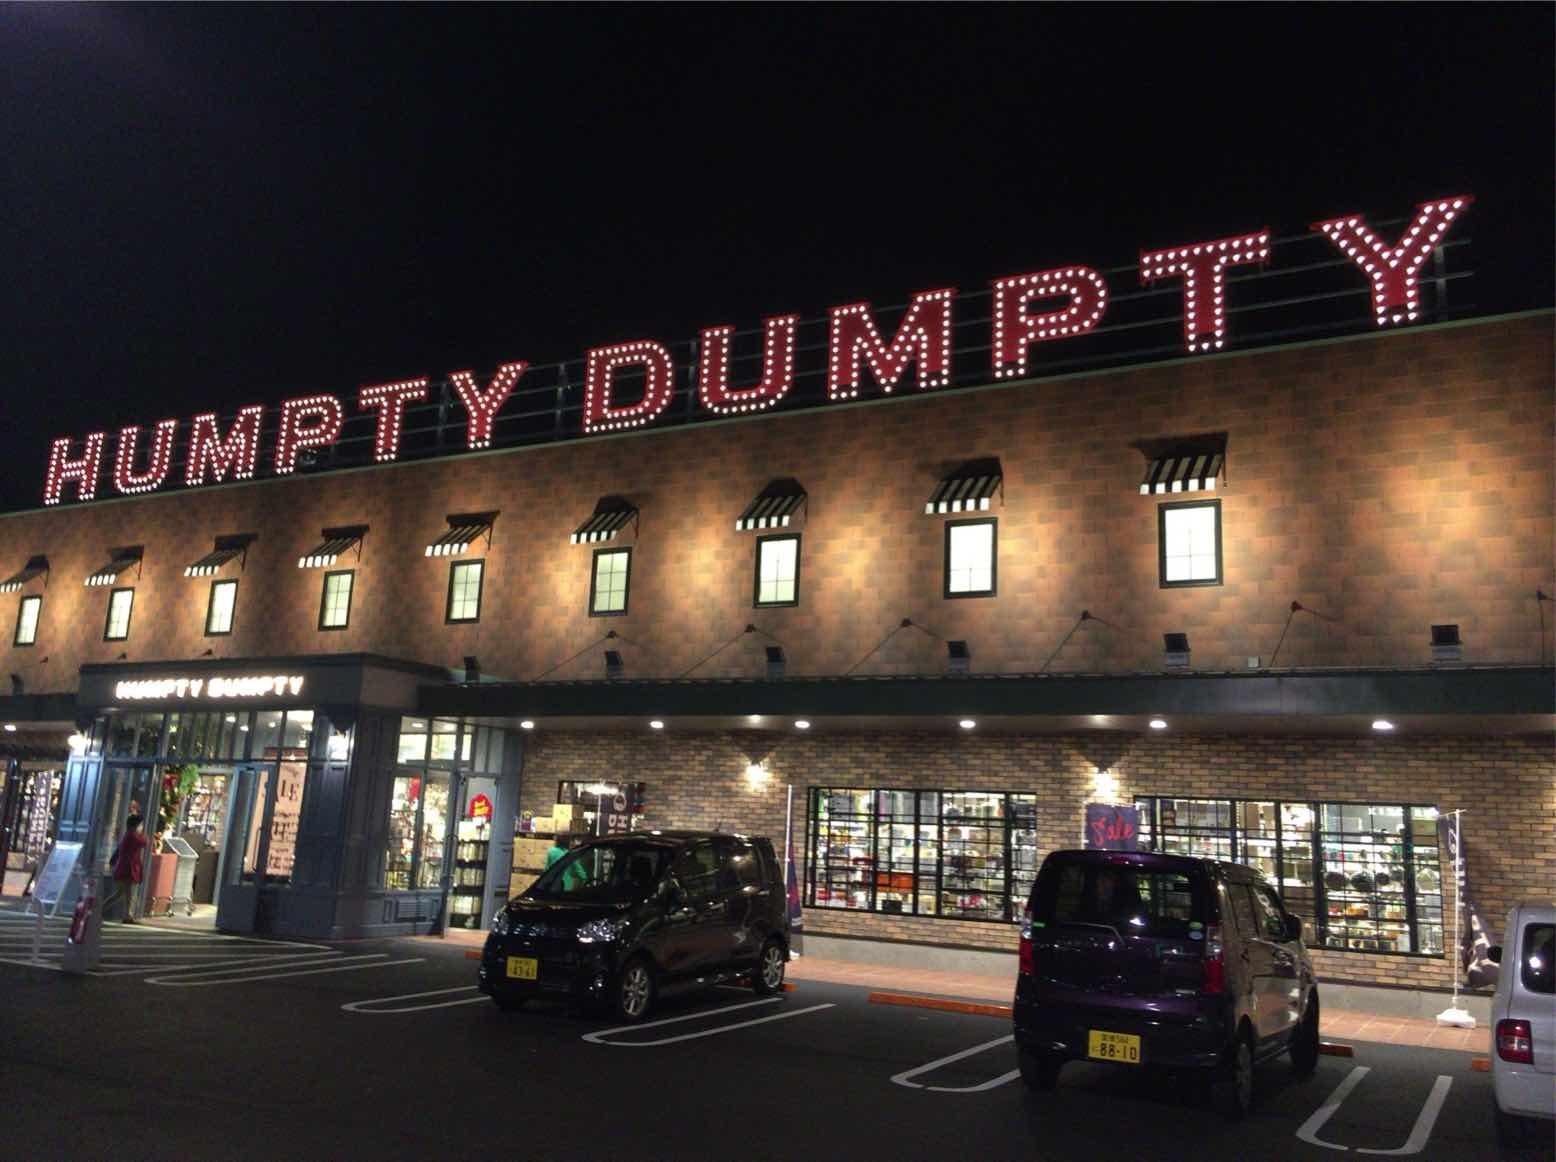 HUMPTY DUMPTY行ってきた  @エミフルMASAKI